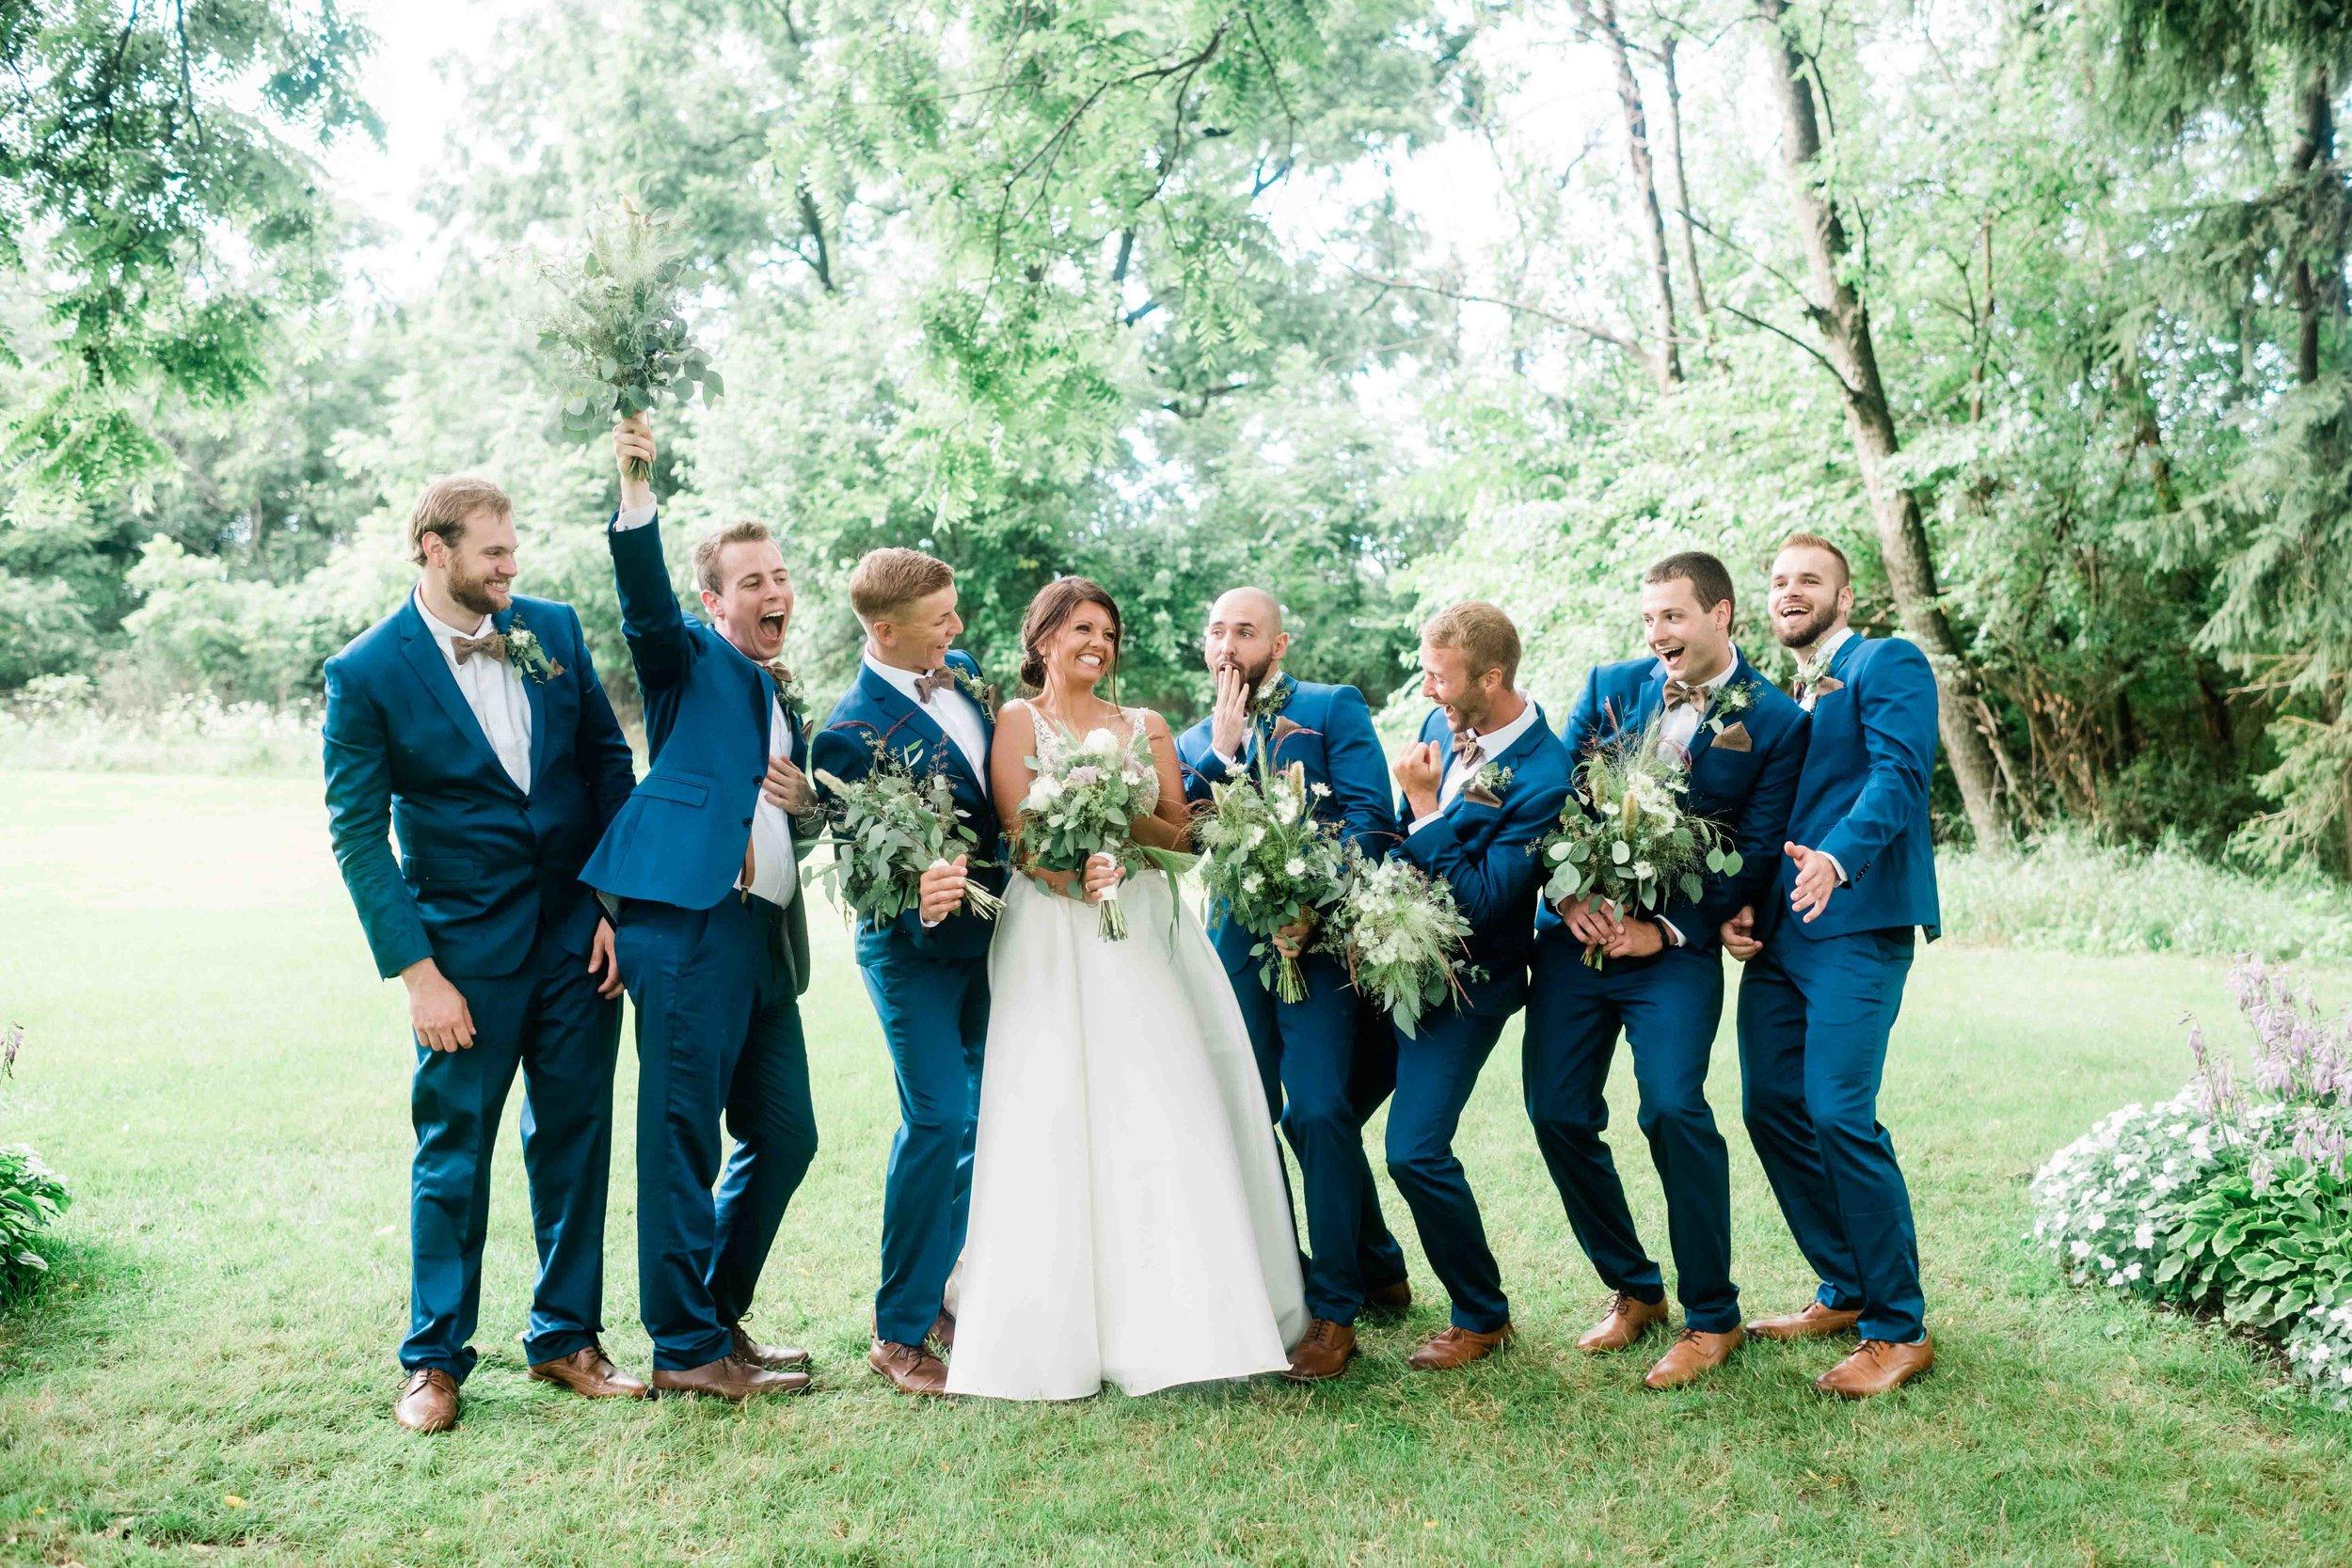 Bride goofs off with groomsmen